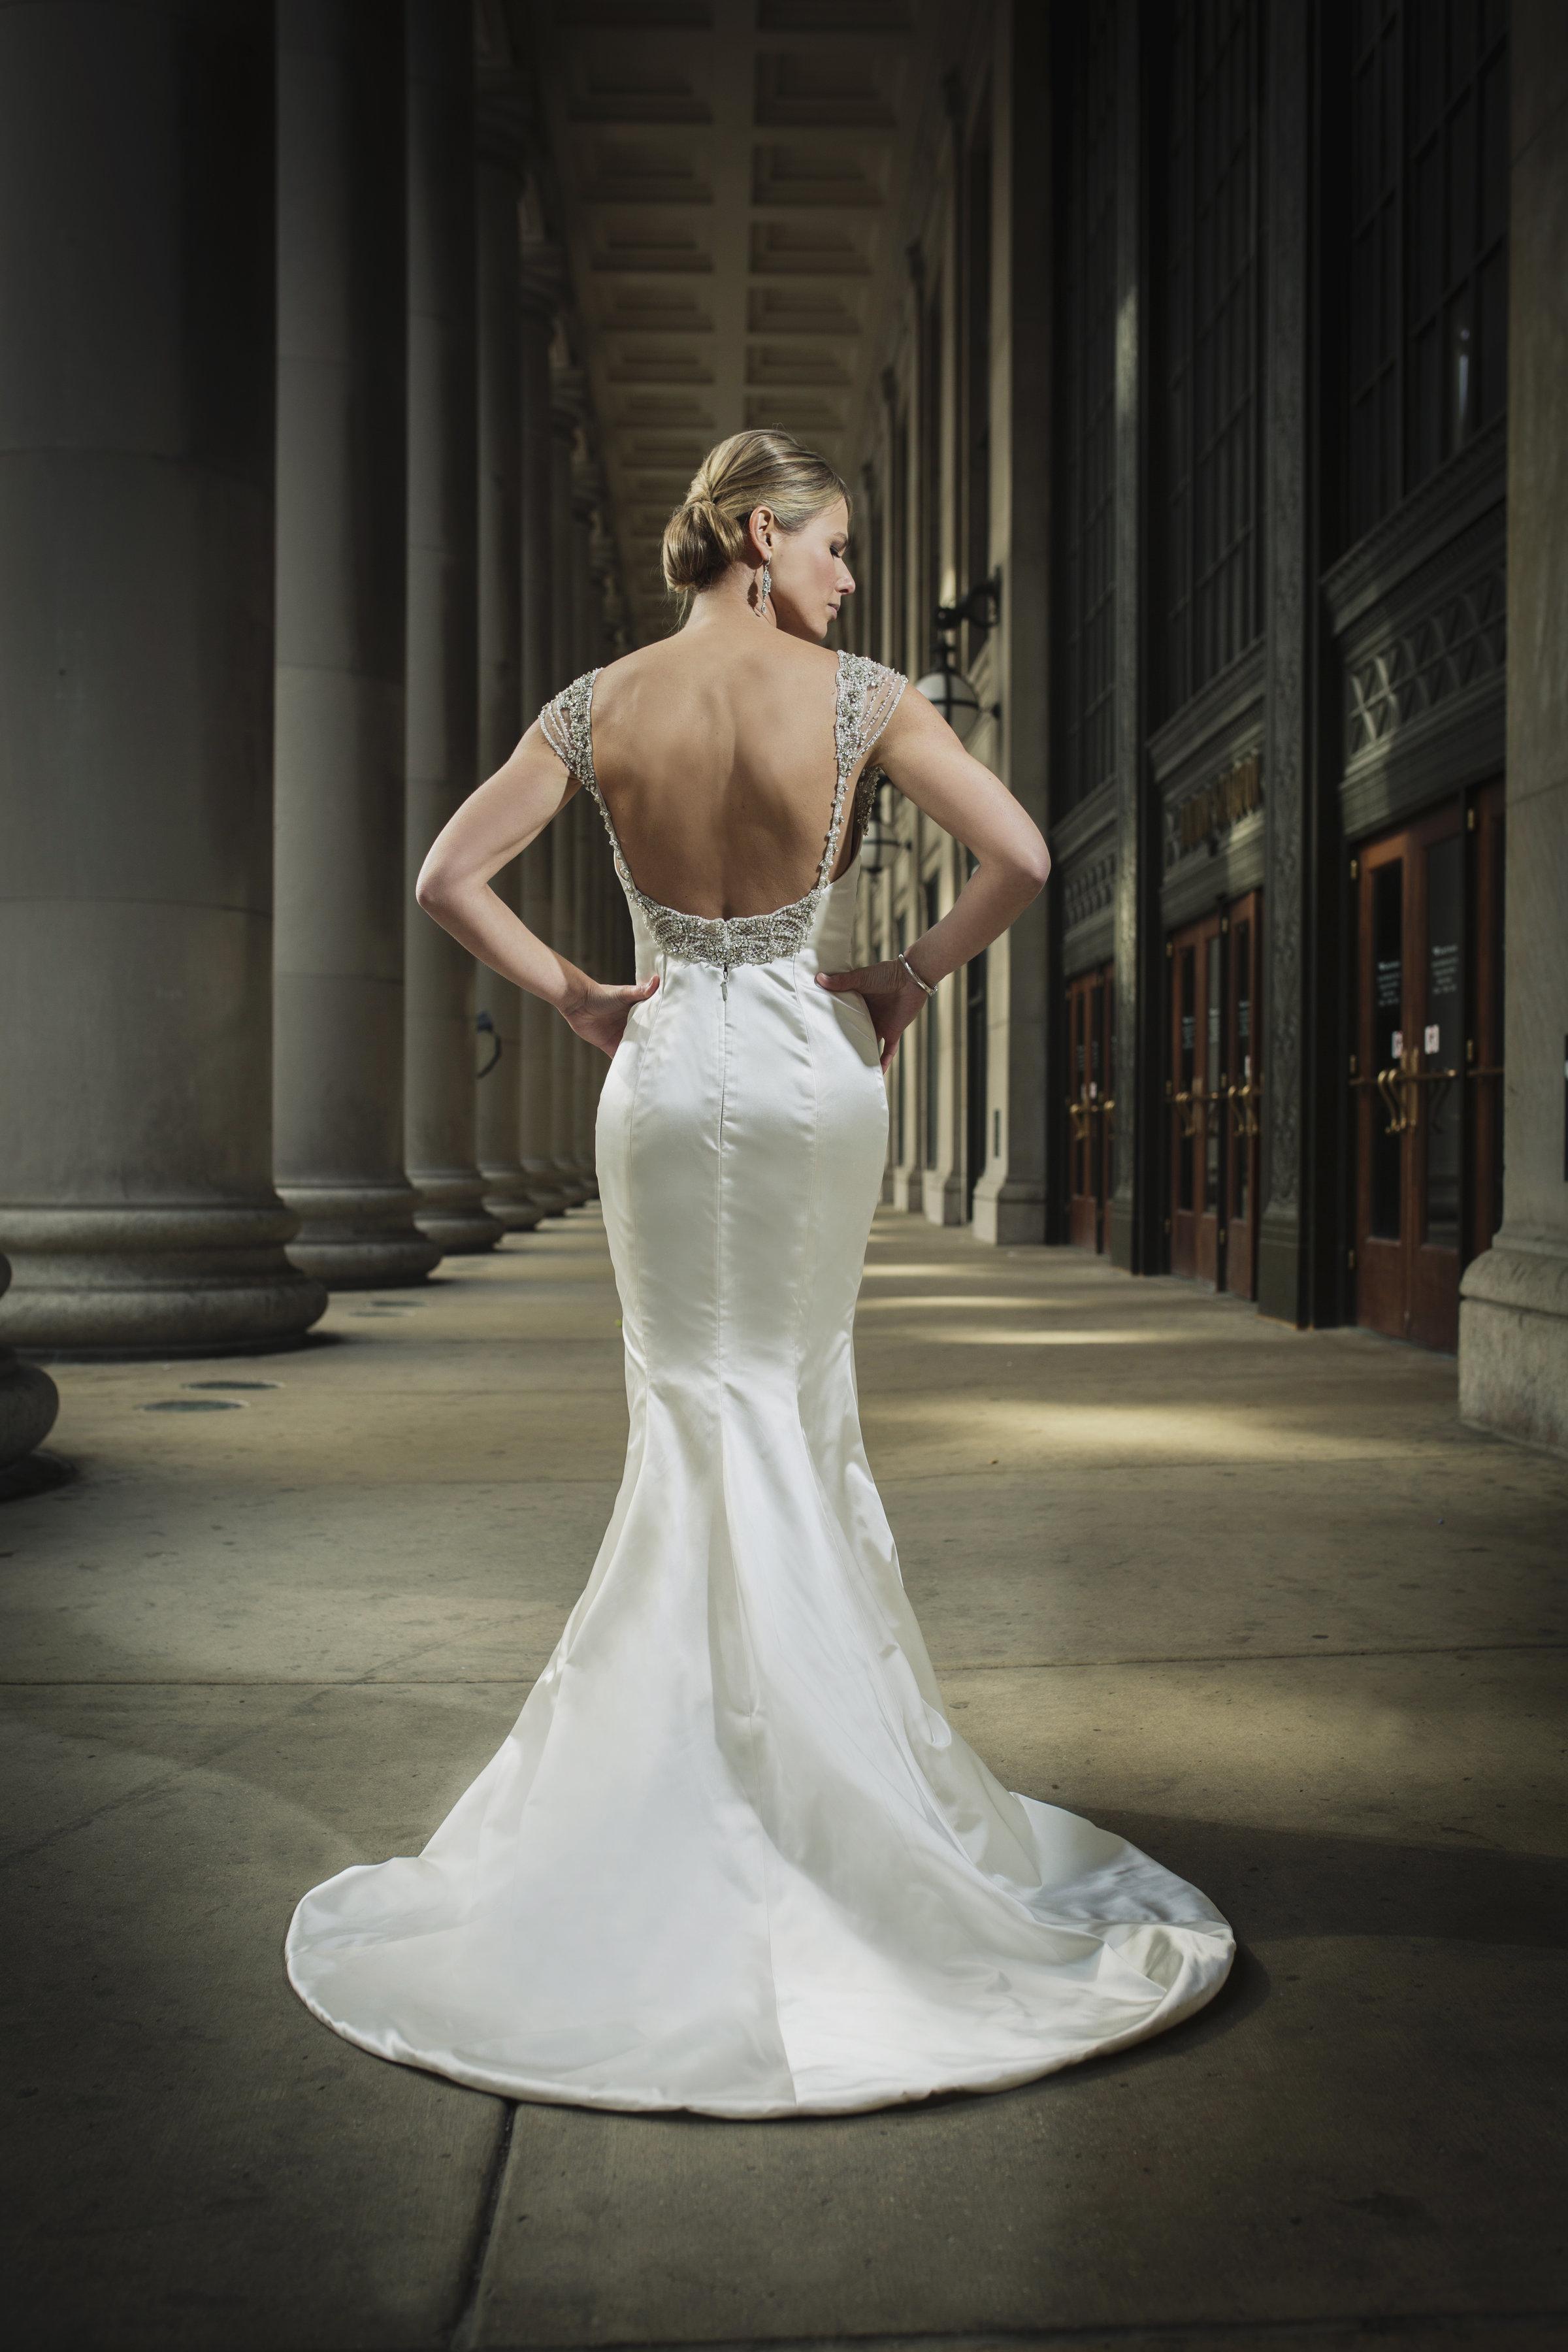 Bridal Portrait at Chicago Cultural Center